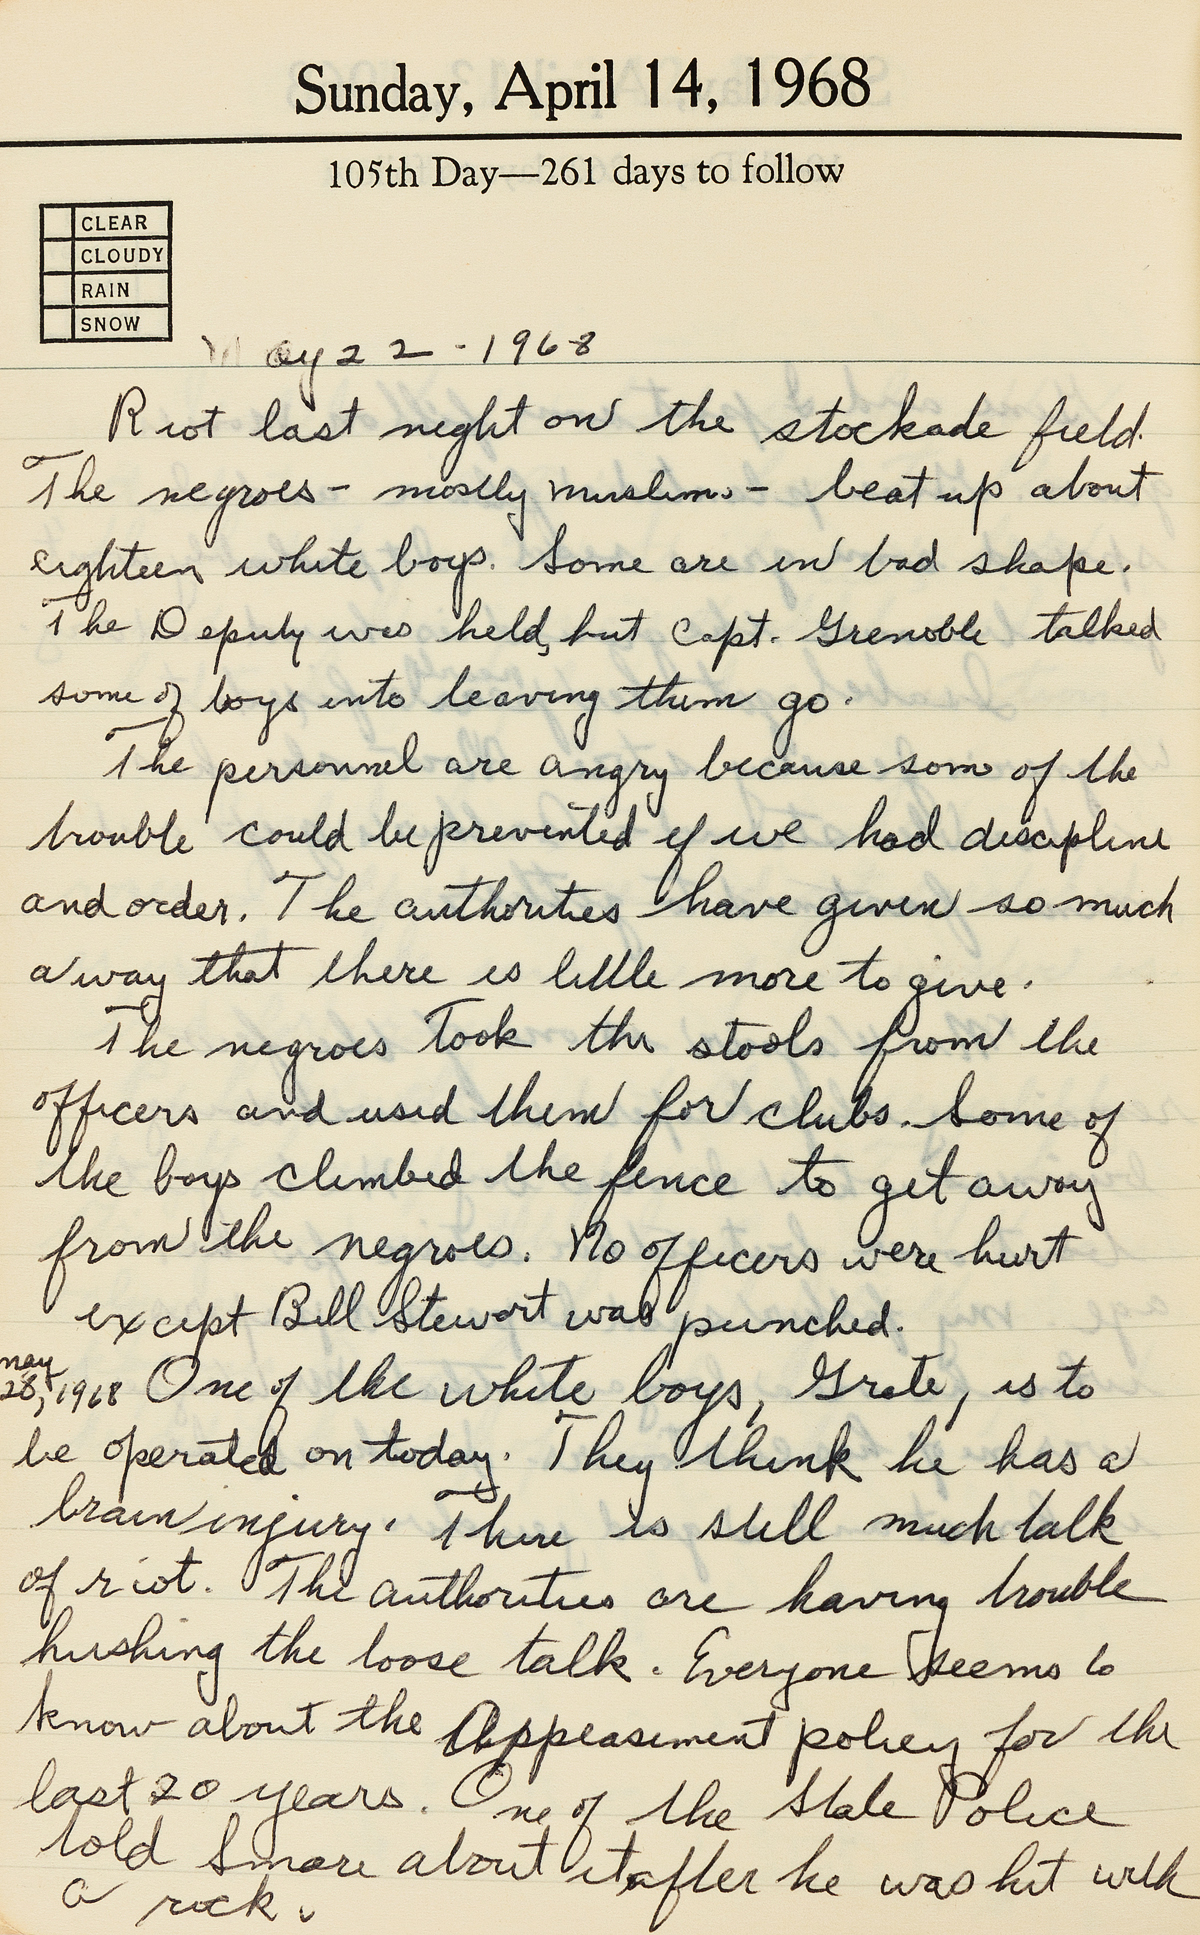 (CIVIL-RIGHTS)-Arthur-H-Snyder-Diary-of-a-prison-educator-du